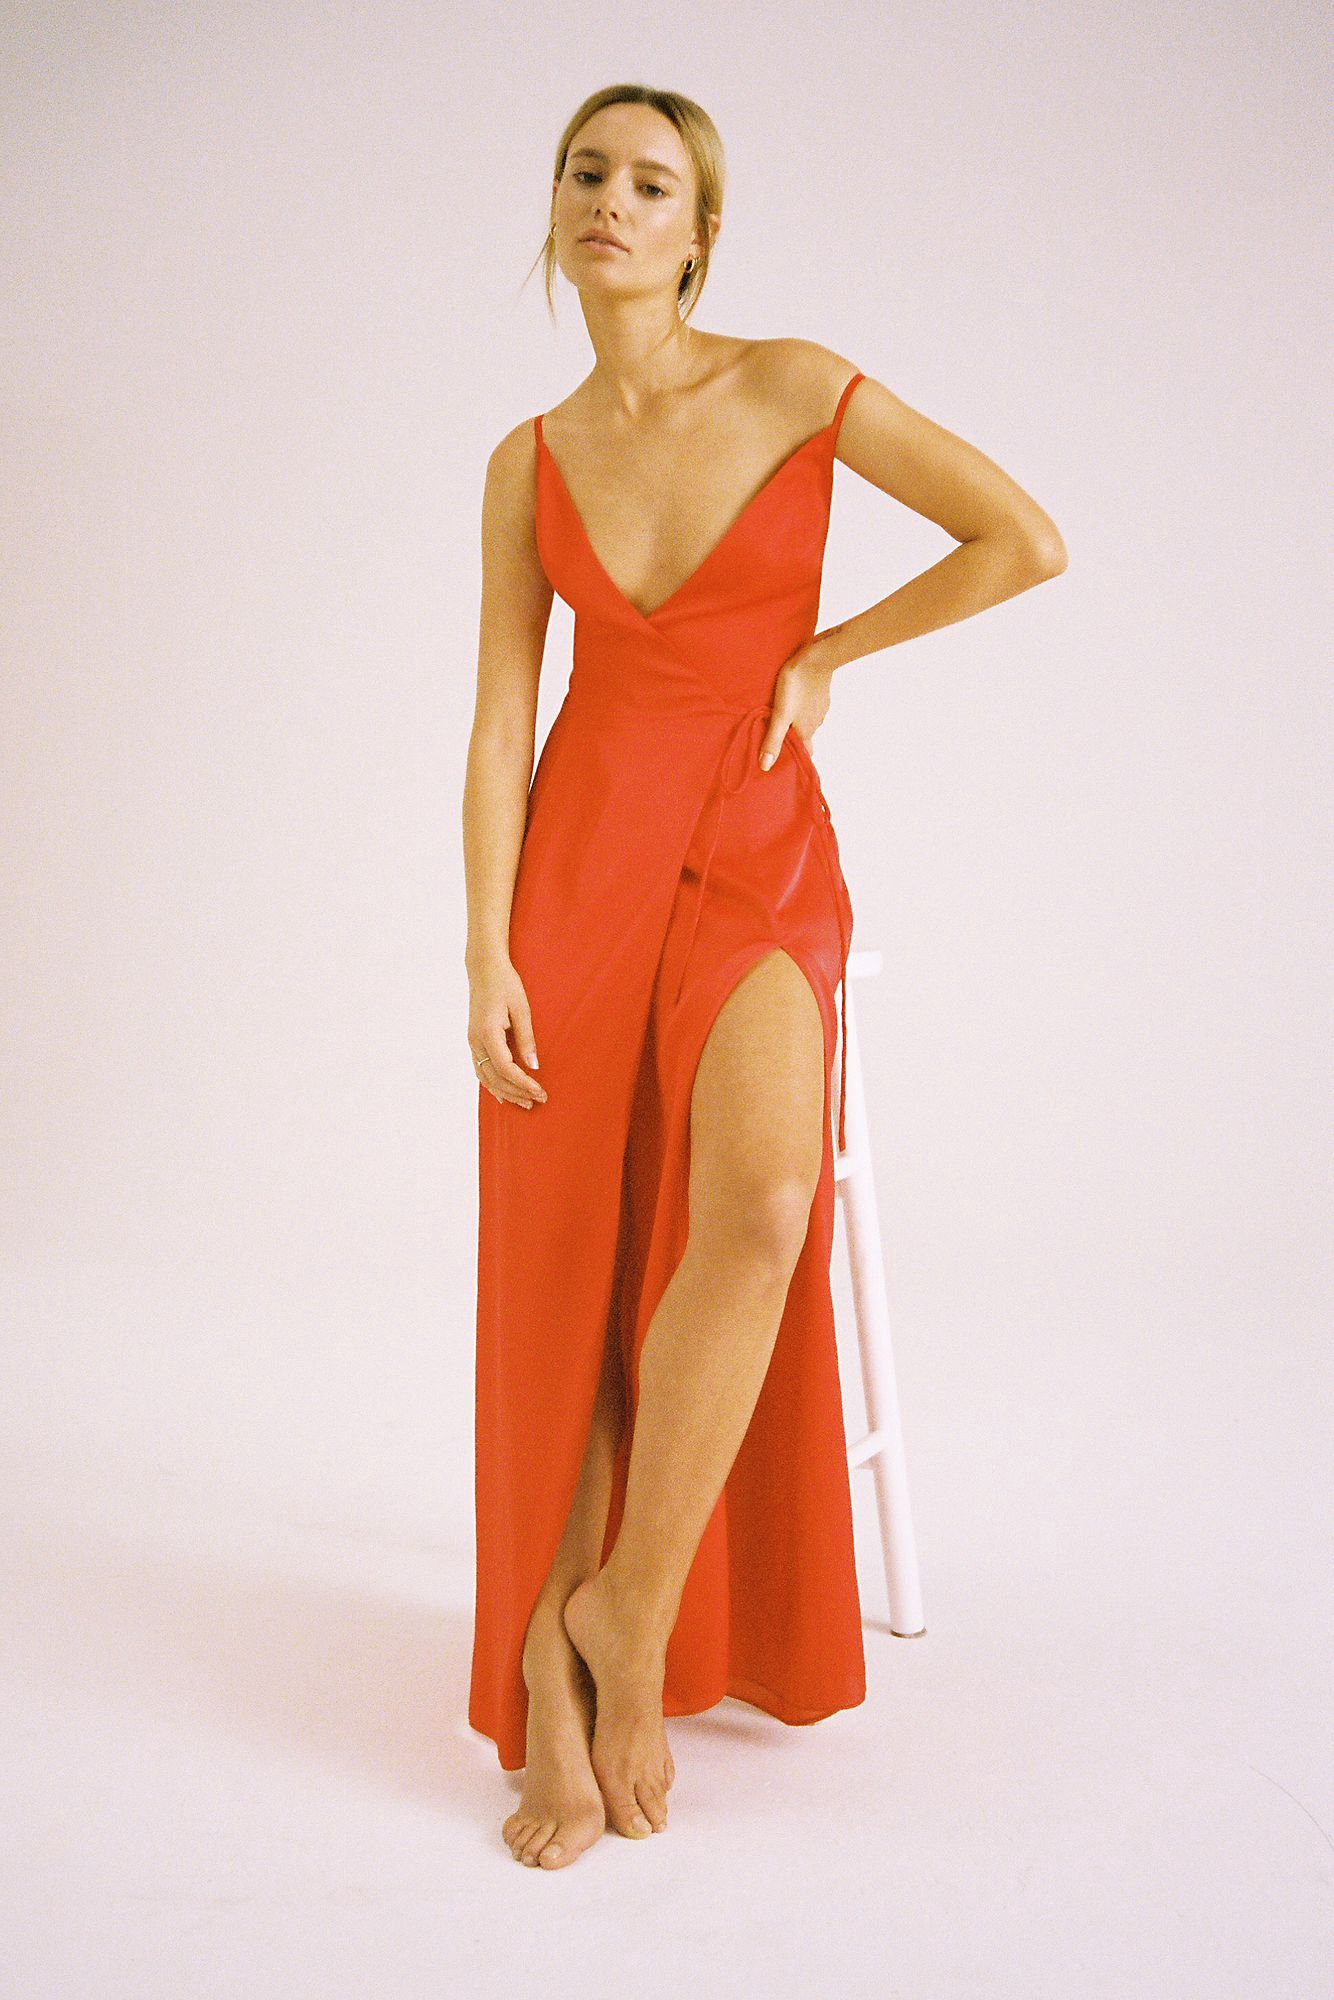 The bond maxi dress by free people dress me up pinterest free